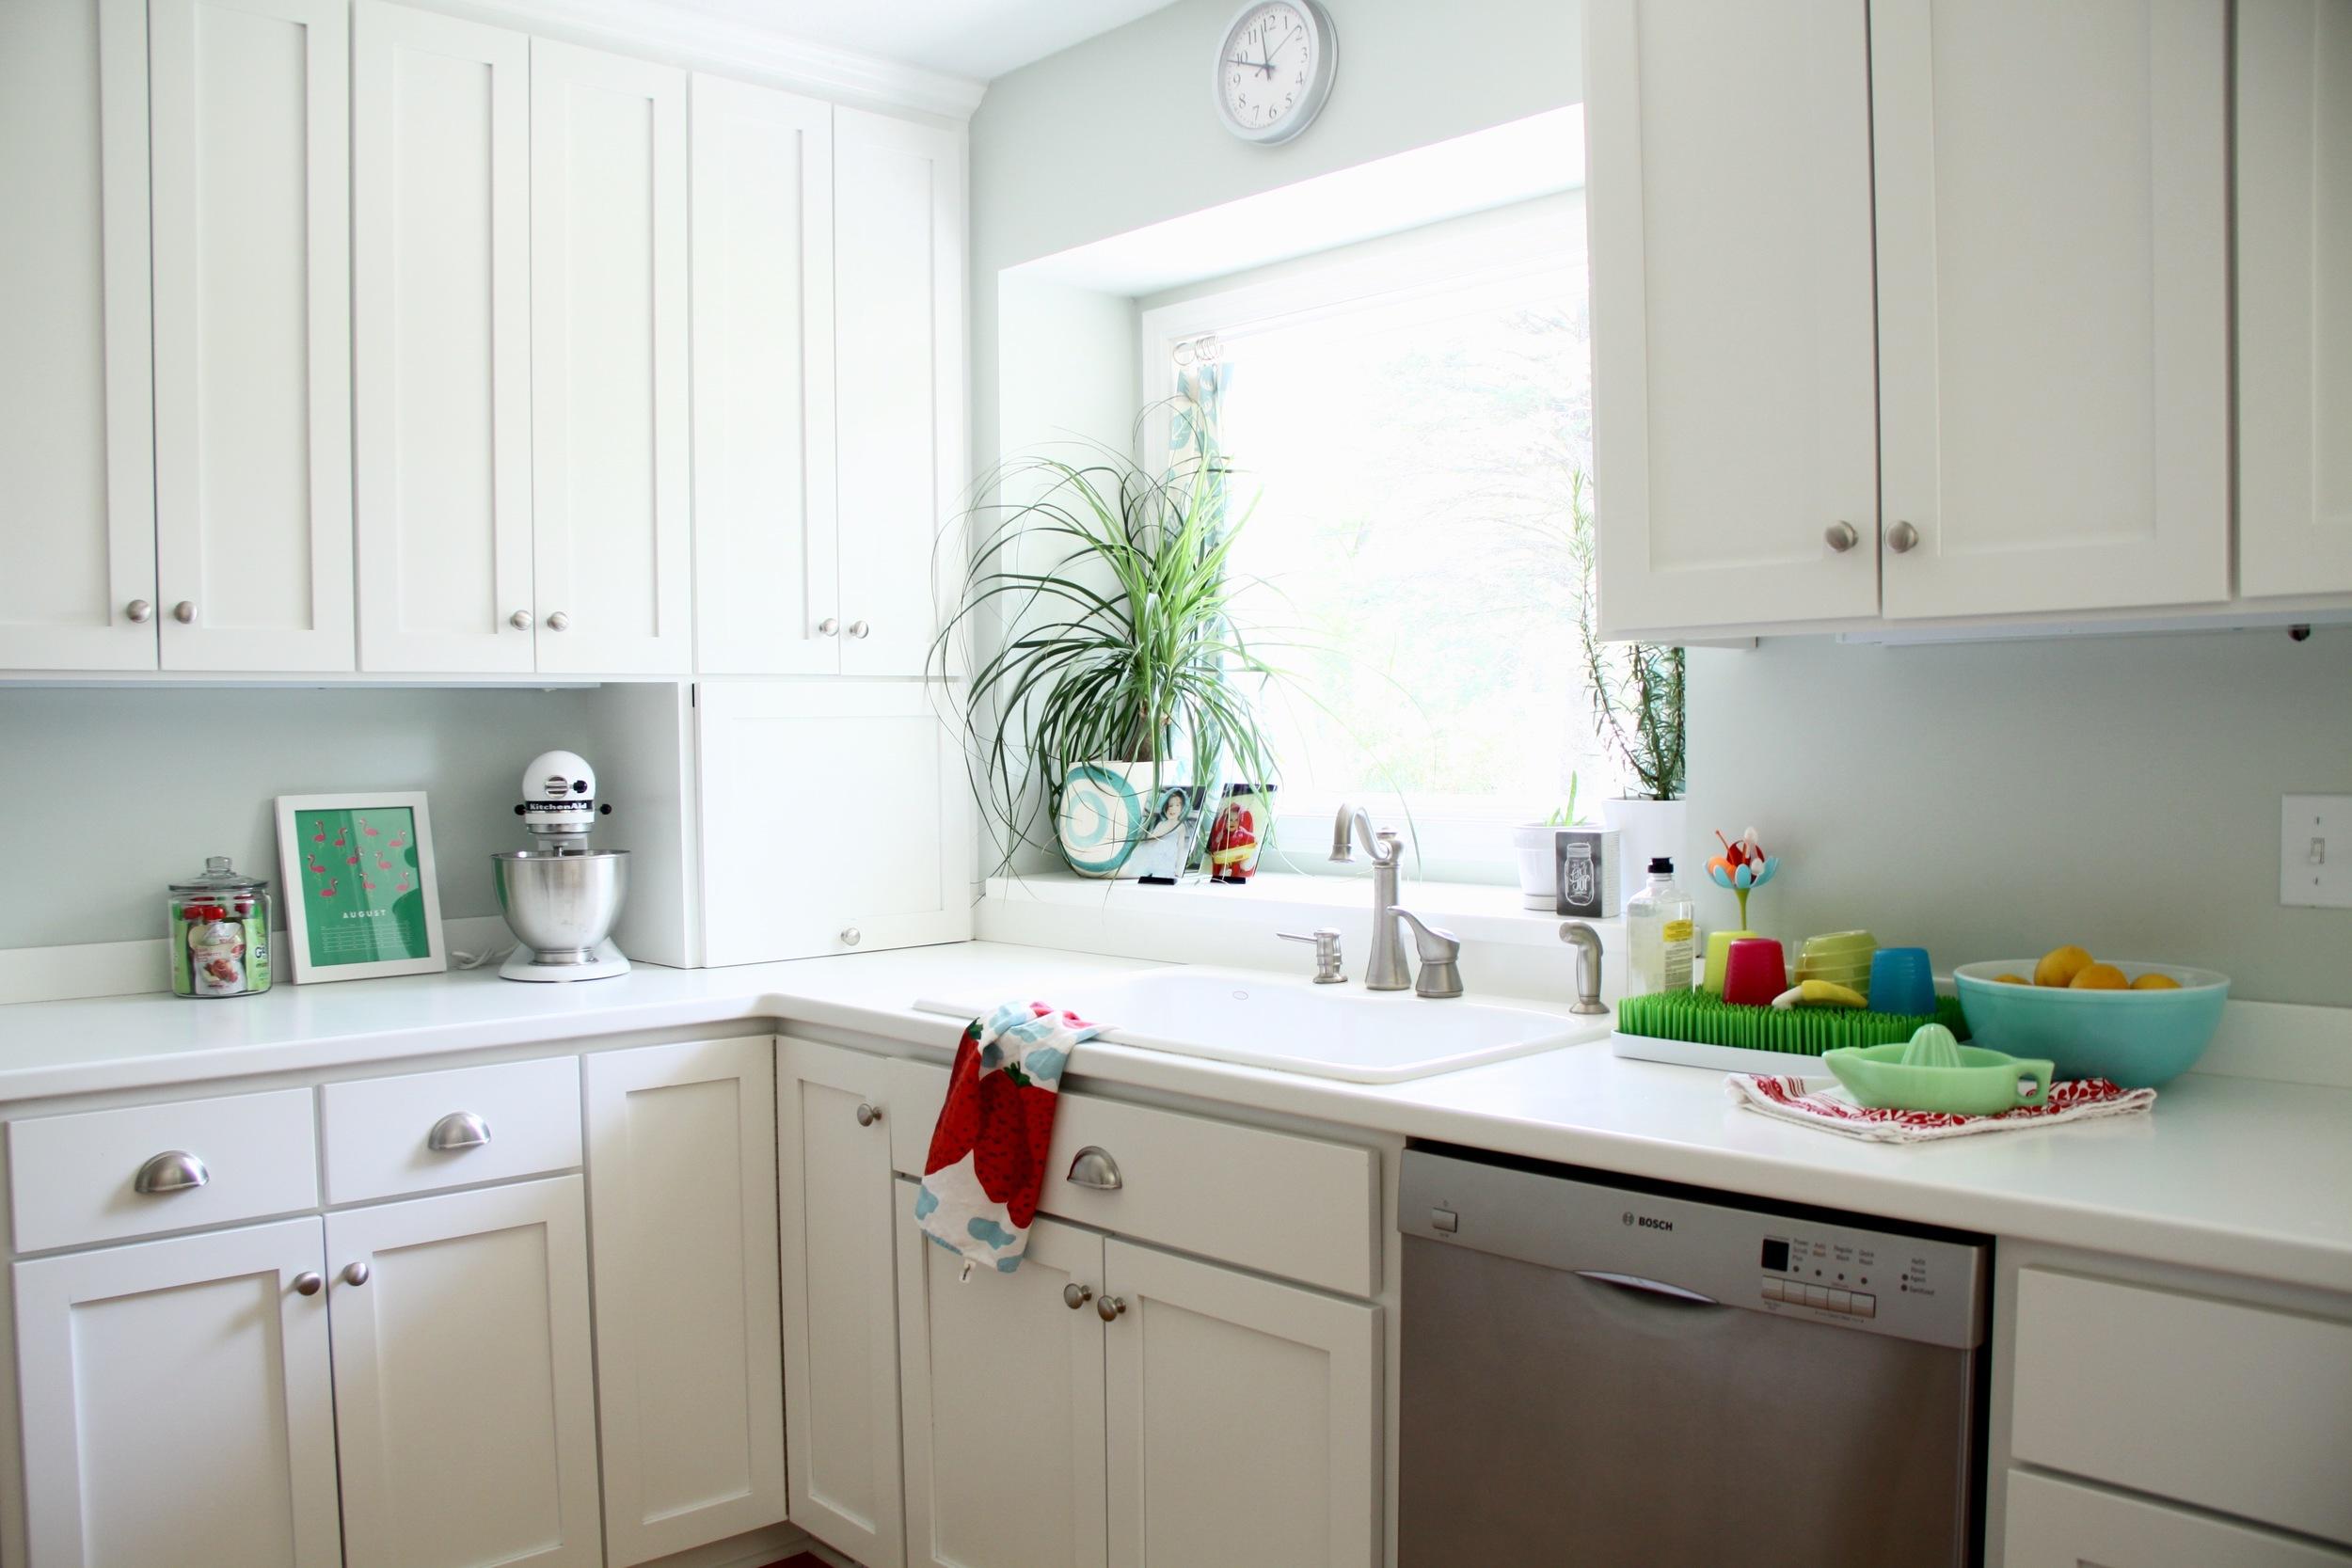 White Kitchen with Corian Countertops